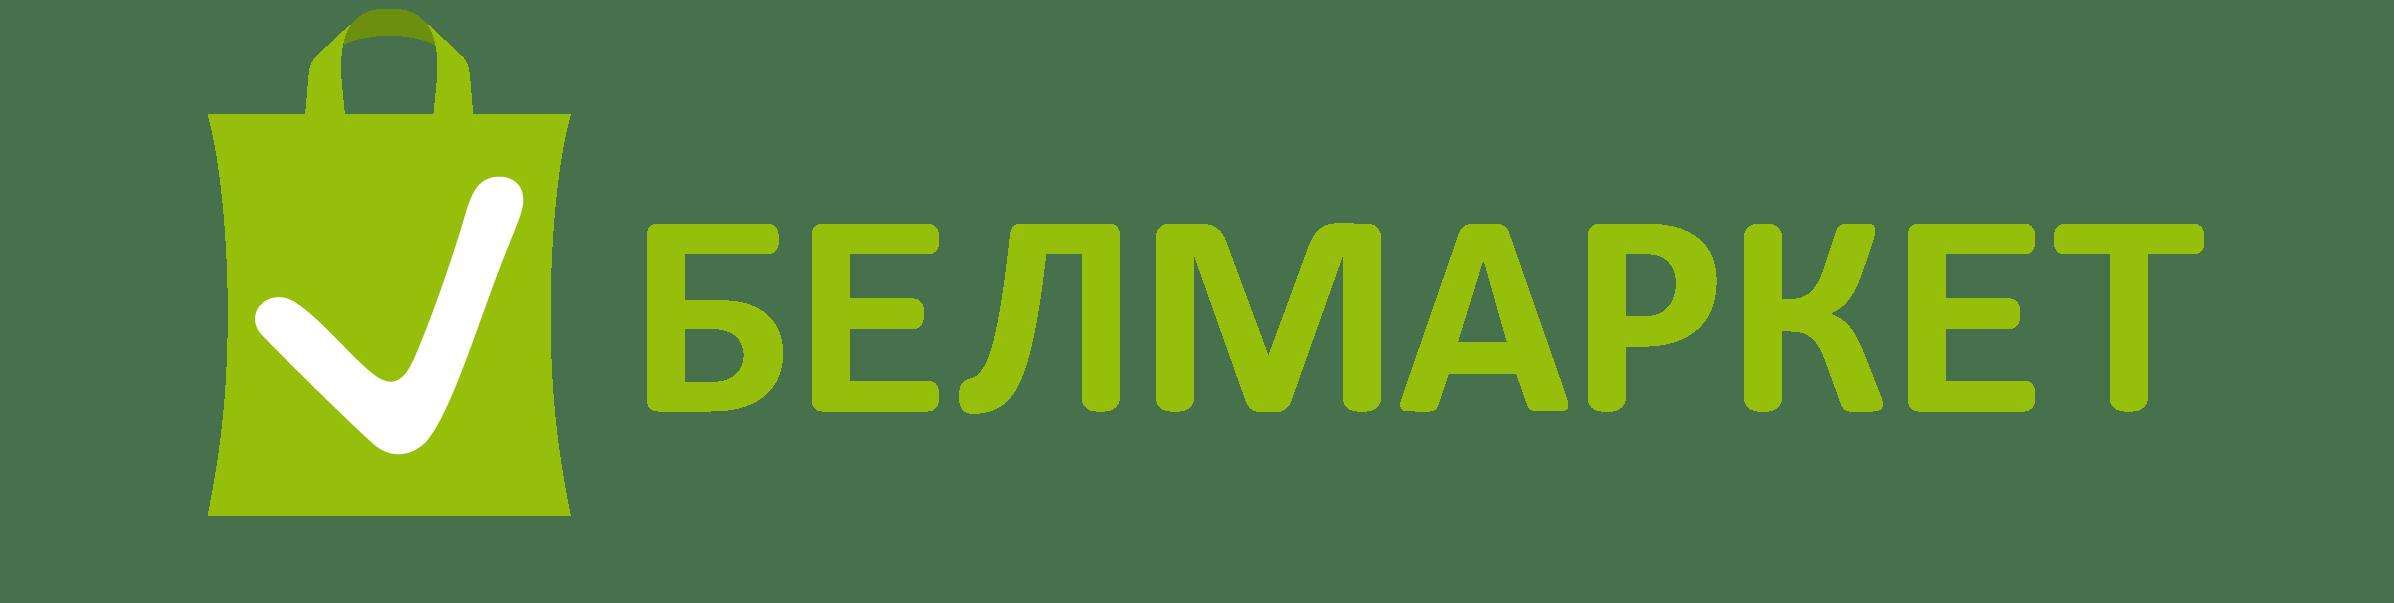 logo belmarket